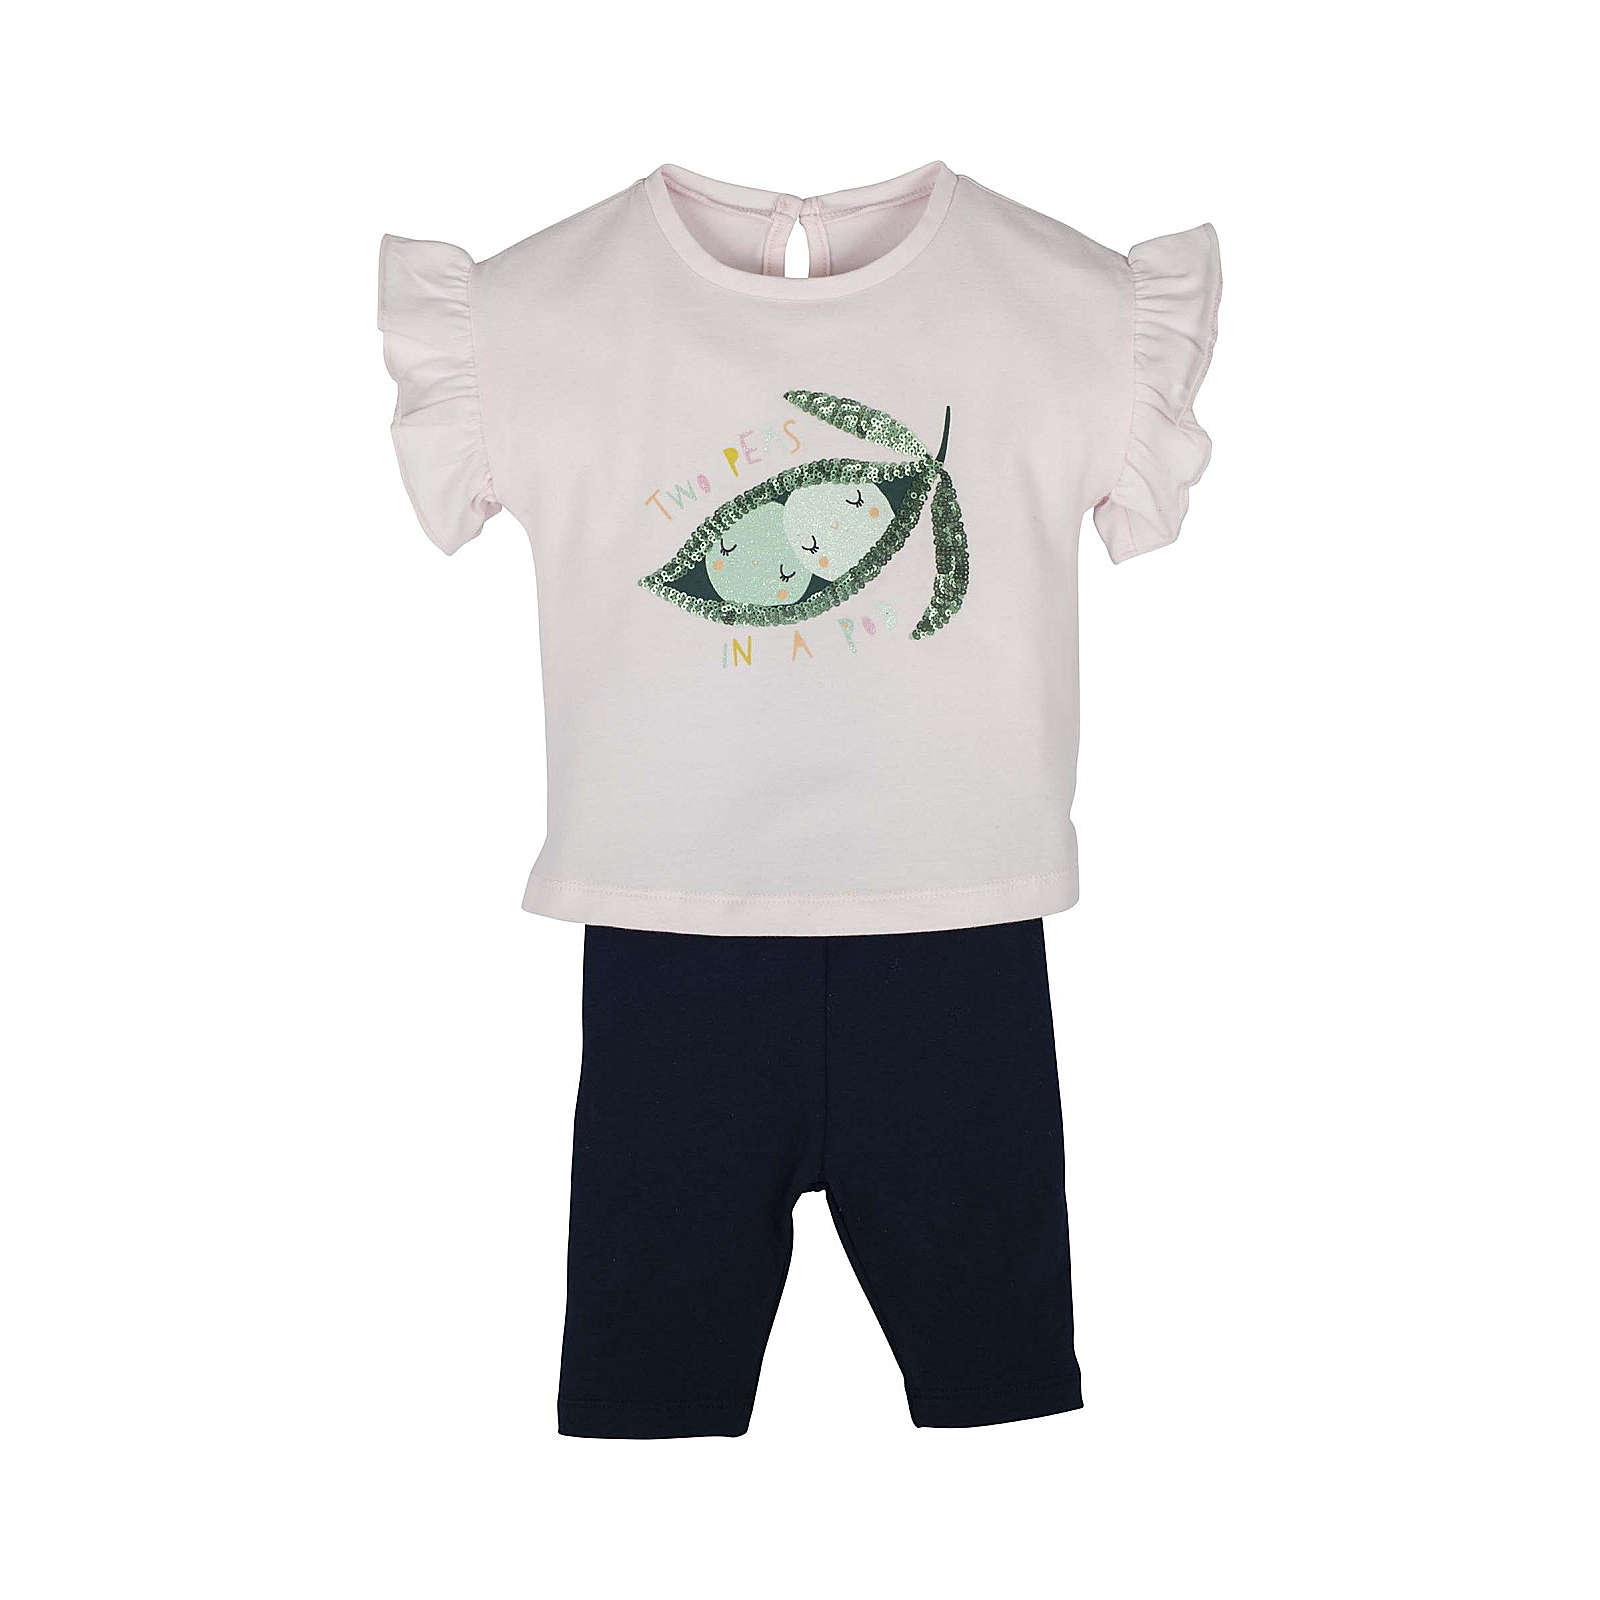 mamino Set T-Shirt mit Hose -Two peas in a pod Anzüge pink Mädchen Gr. 62/68